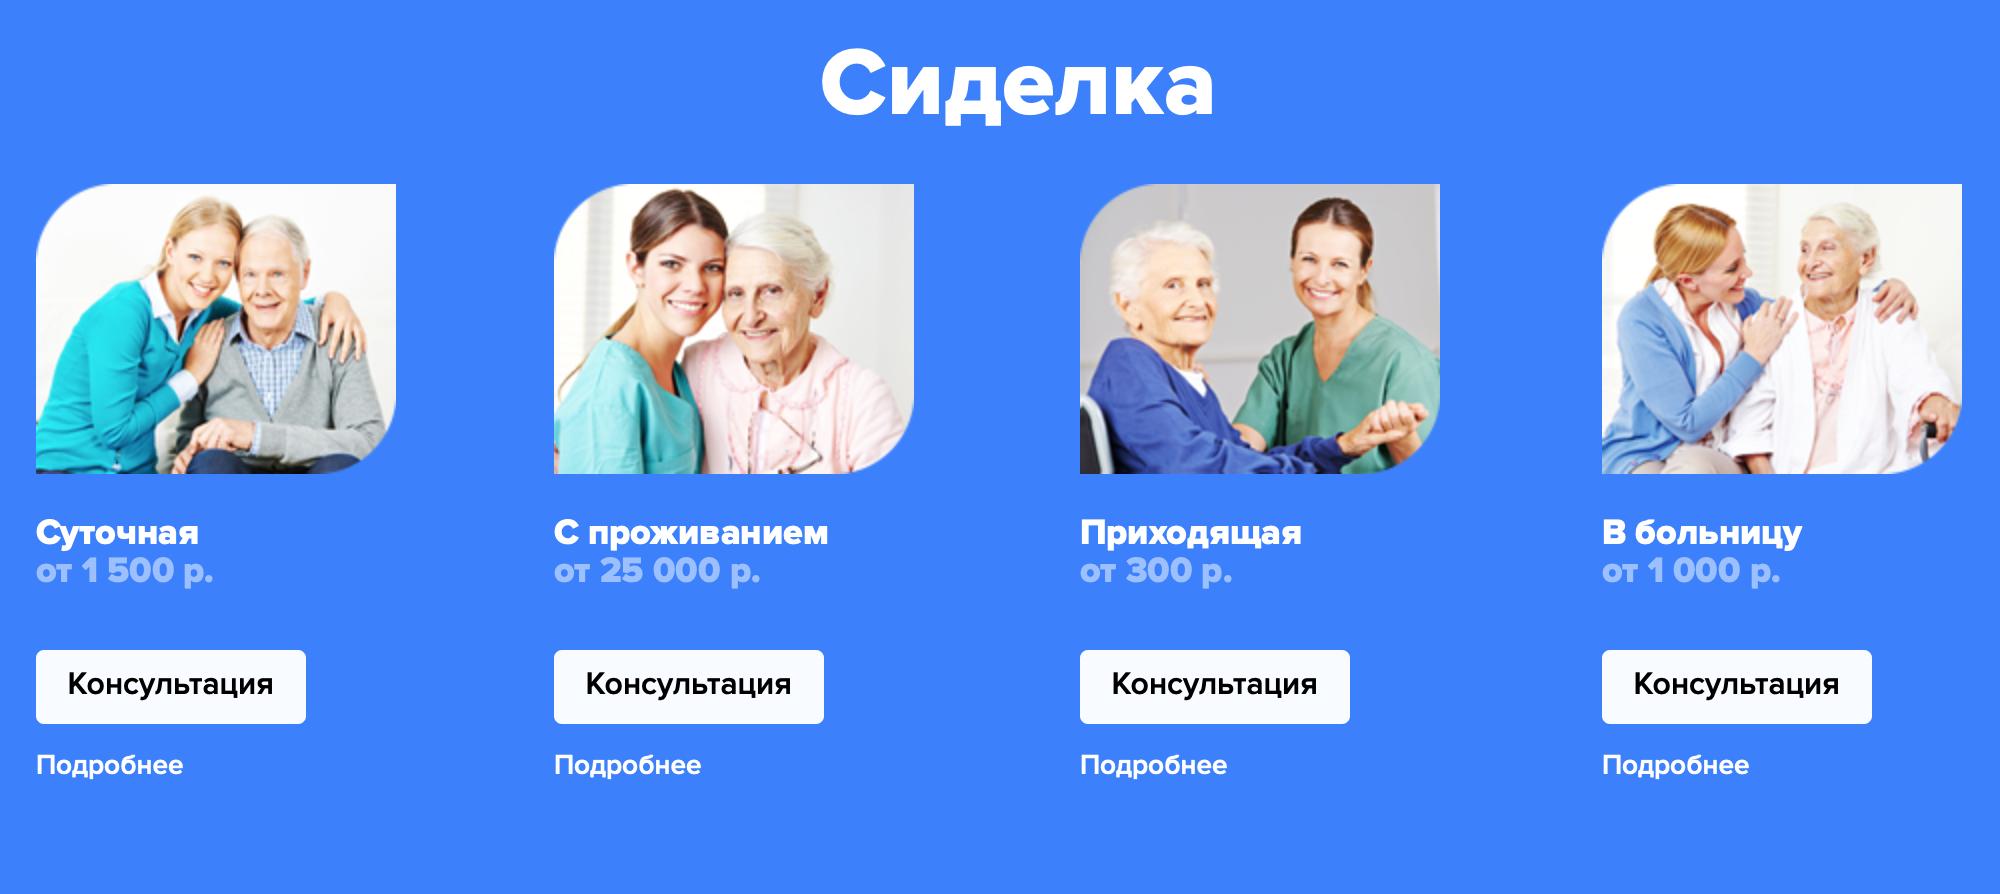 В Санкт-Петербурге час стоит от 300<span class=ruble>Р</span>, сутки — от 1500<span class=ruble>Р</span>, месяц — от 25 000<span class=ruble>Р</span>. Источник: «Аломед»